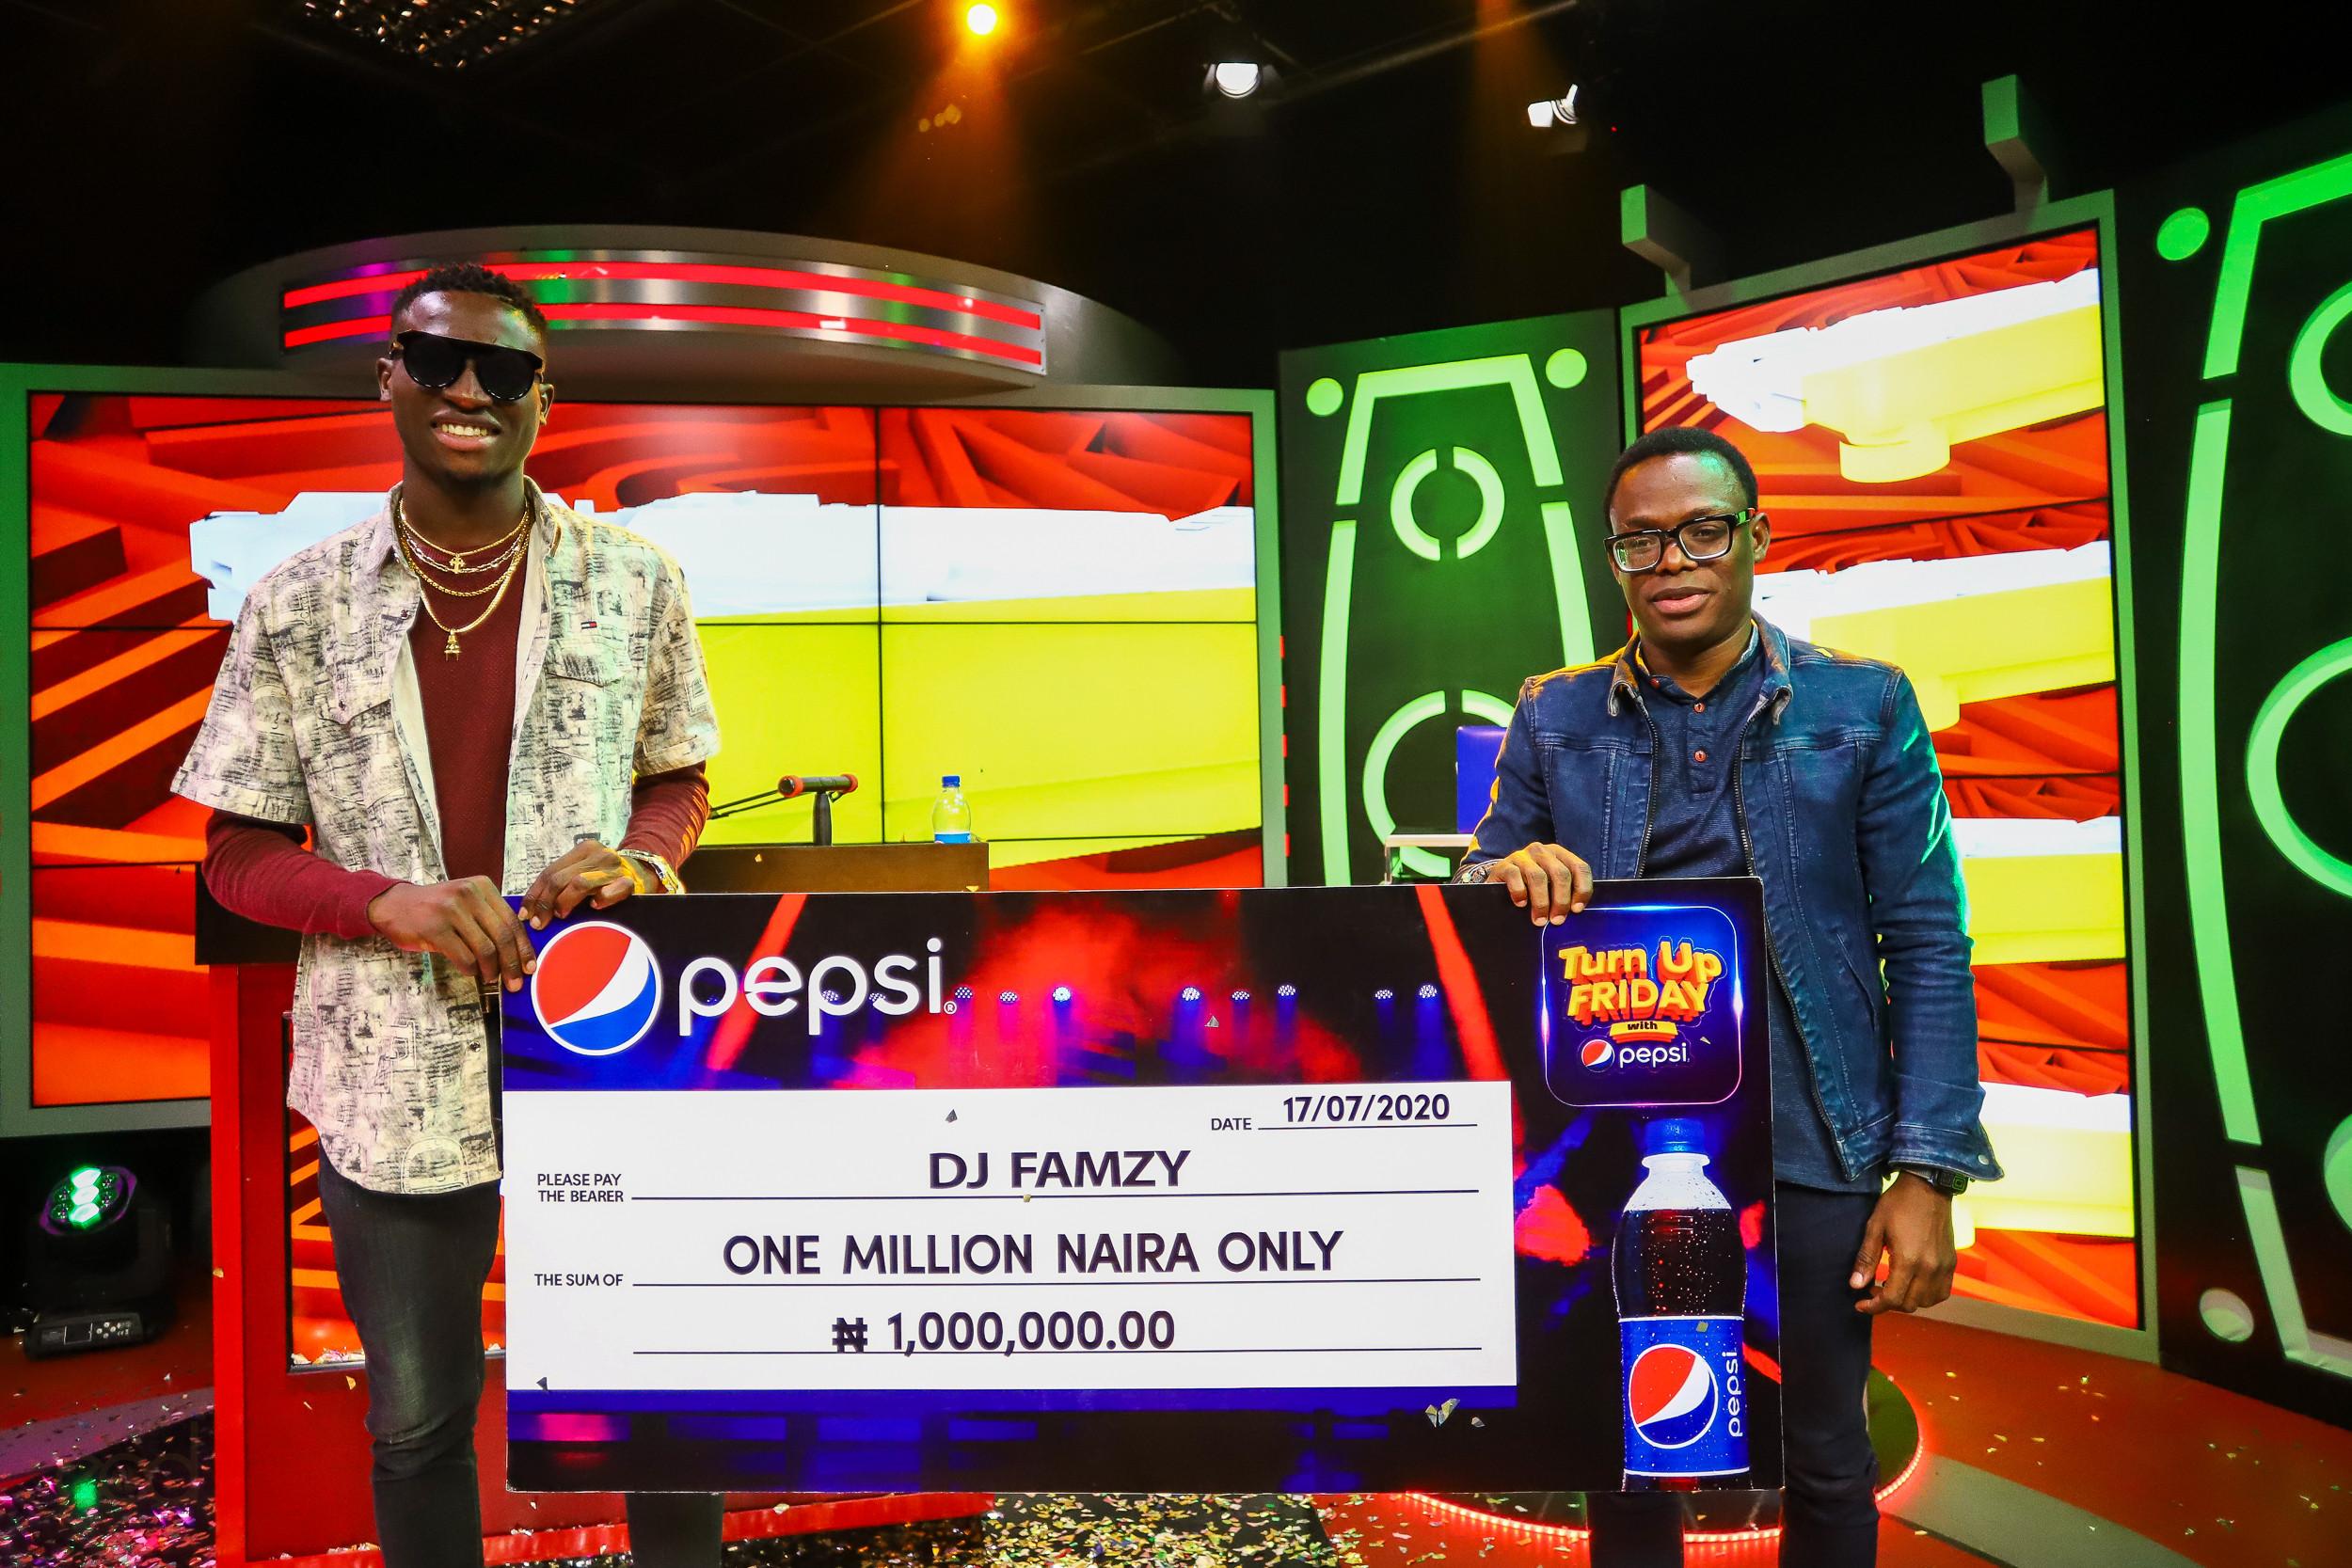 Introducing the latest DJ Superstar, DJ Famzy, Winner of Pepsi Upcoming DJ competition